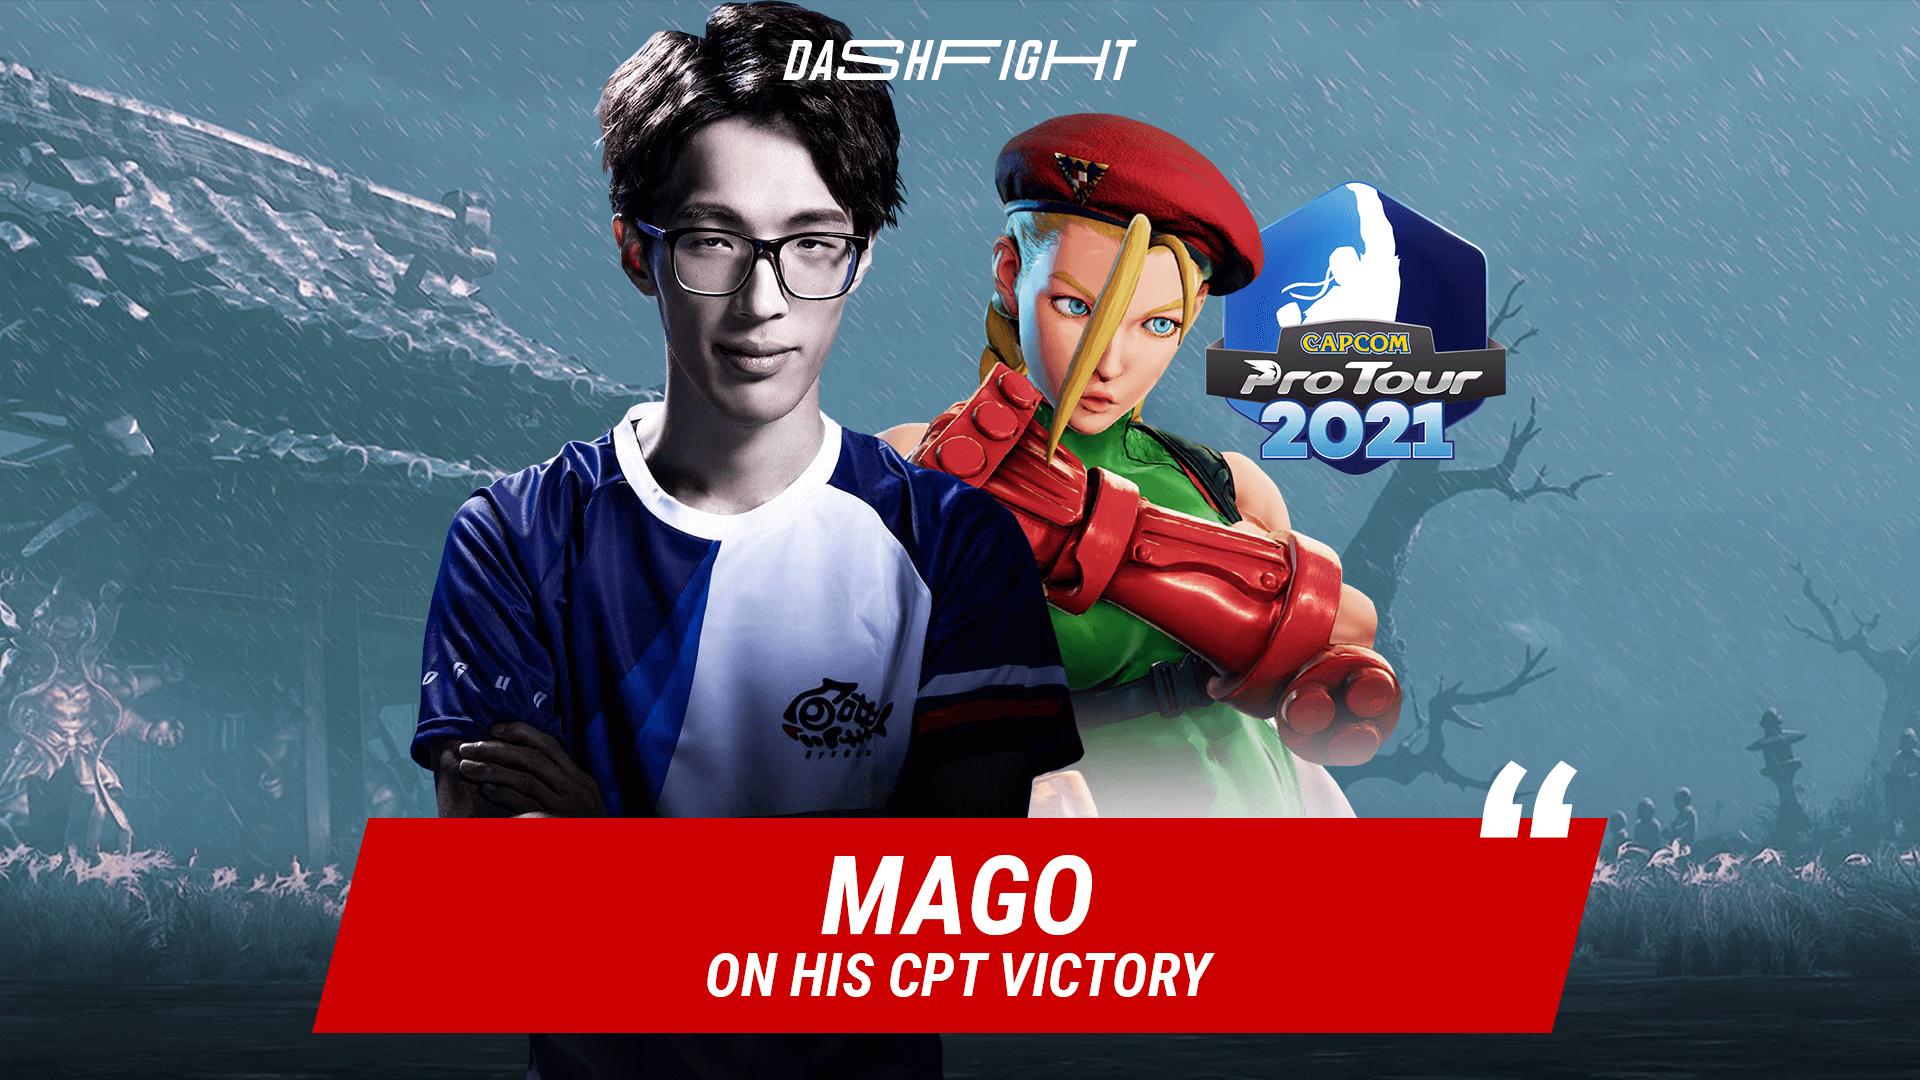 DashFight Interview: Mago, the Winner of CPT 2021 Japan 1